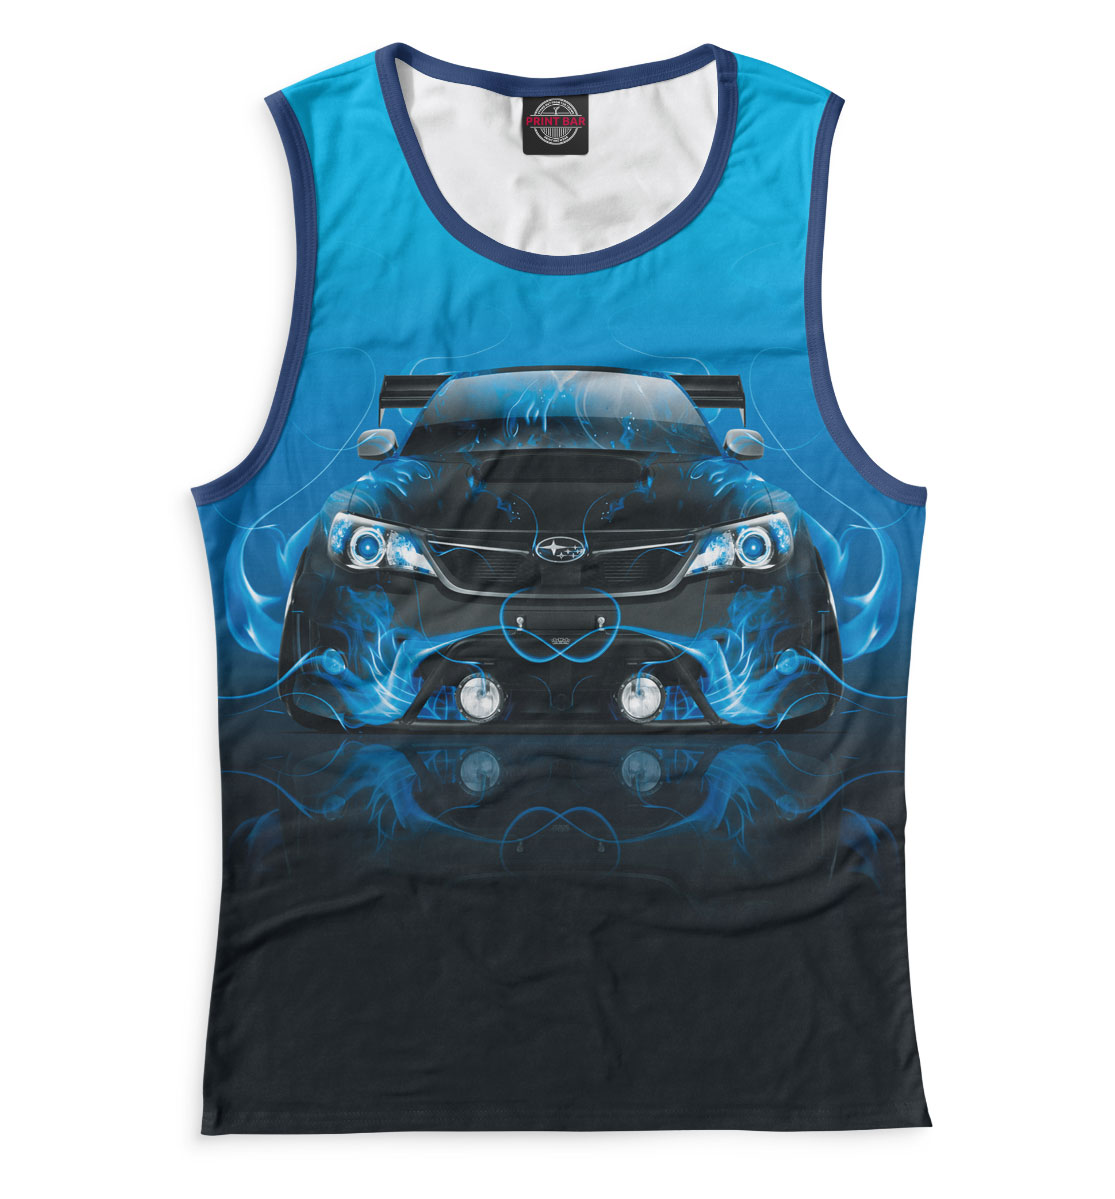 Купить Subaru, Printbar, Майки, SBR-741658-may-1